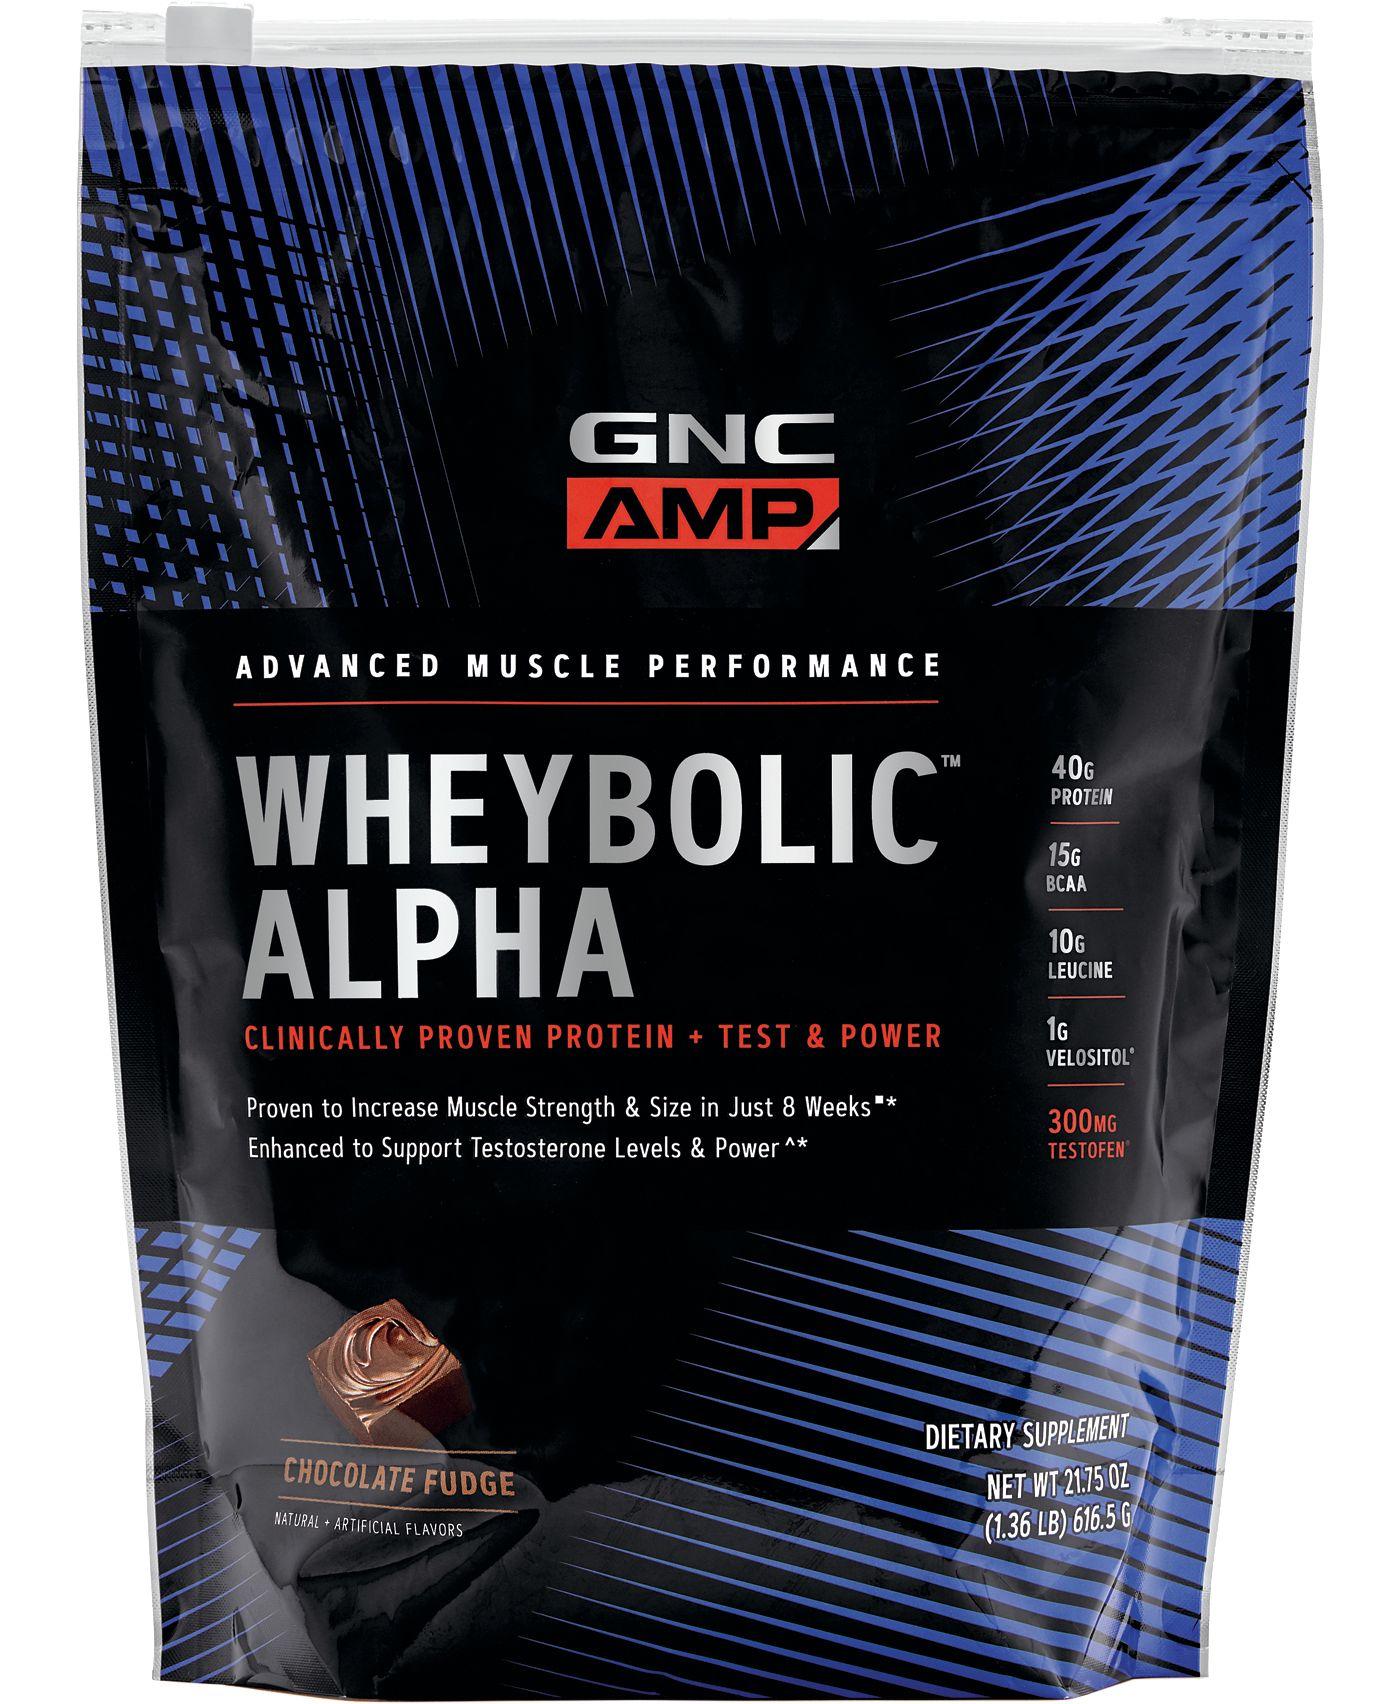 GNC AMP Wheybolic Alpha Protein Chocolate Fudge 9 Servings